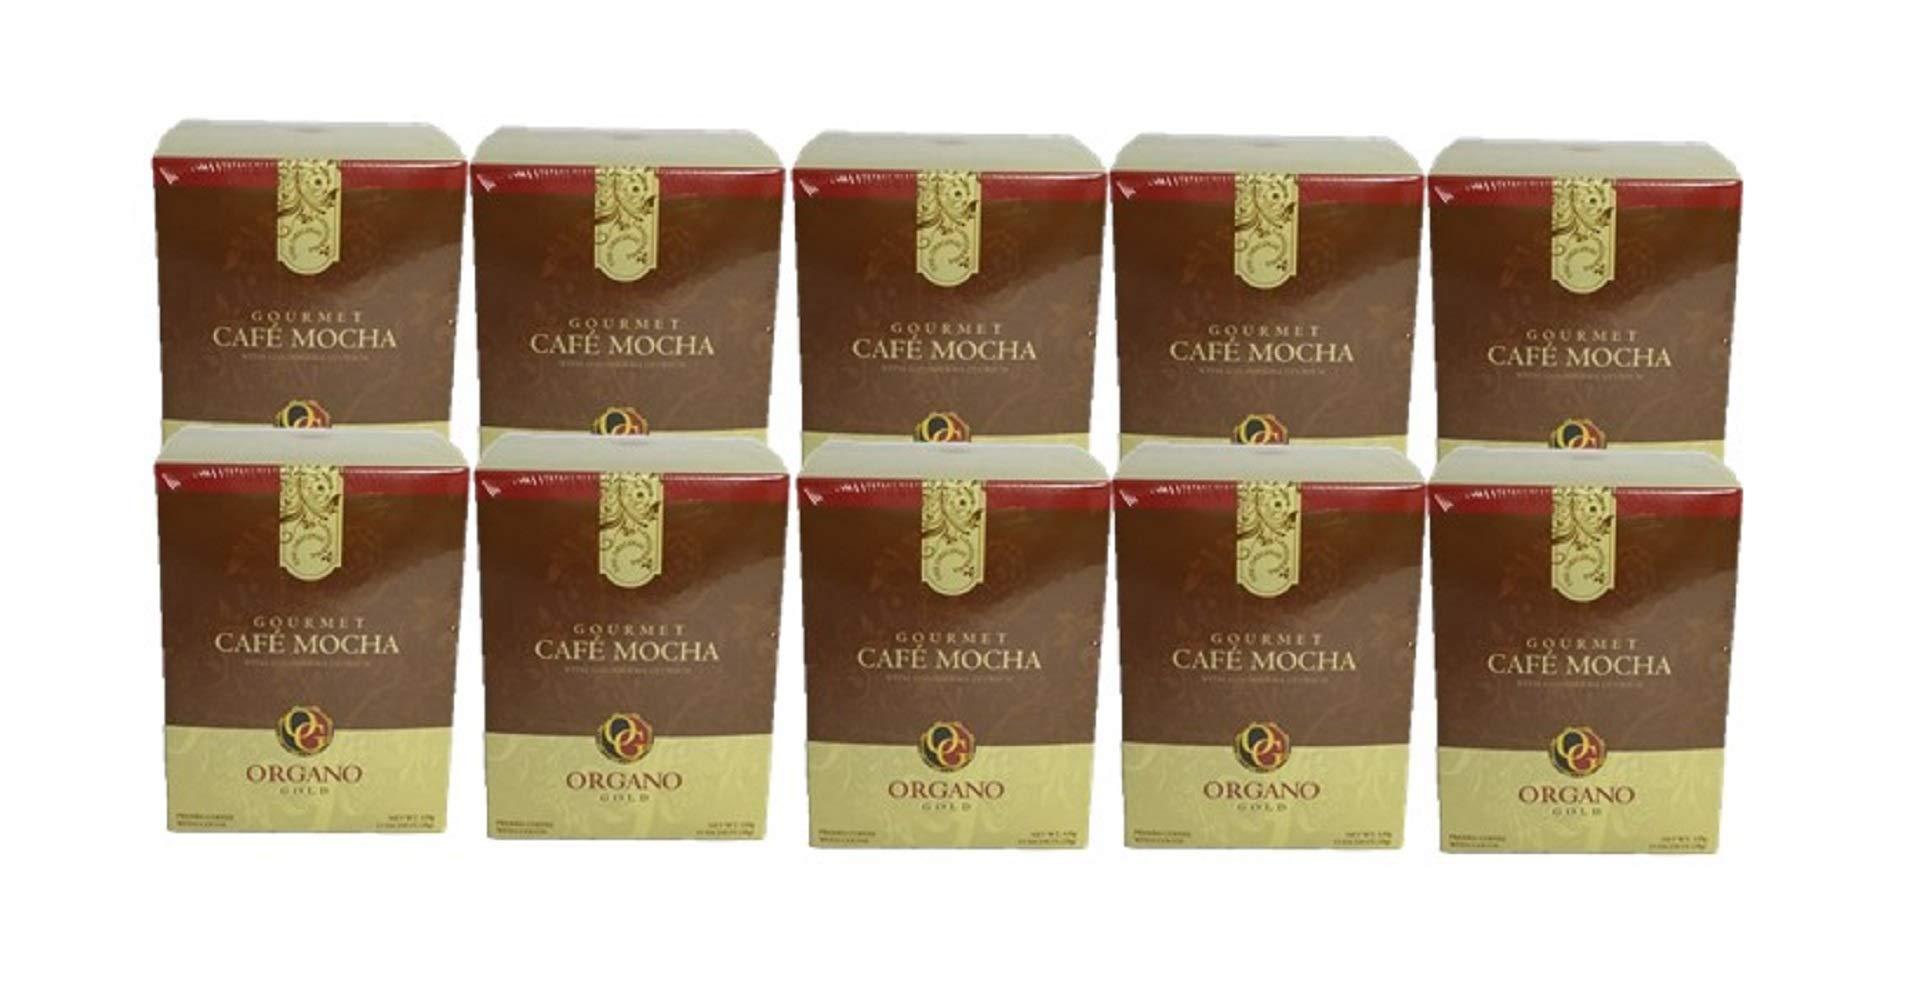 Organo Gold - Cafe Mocha (10 Boxes)